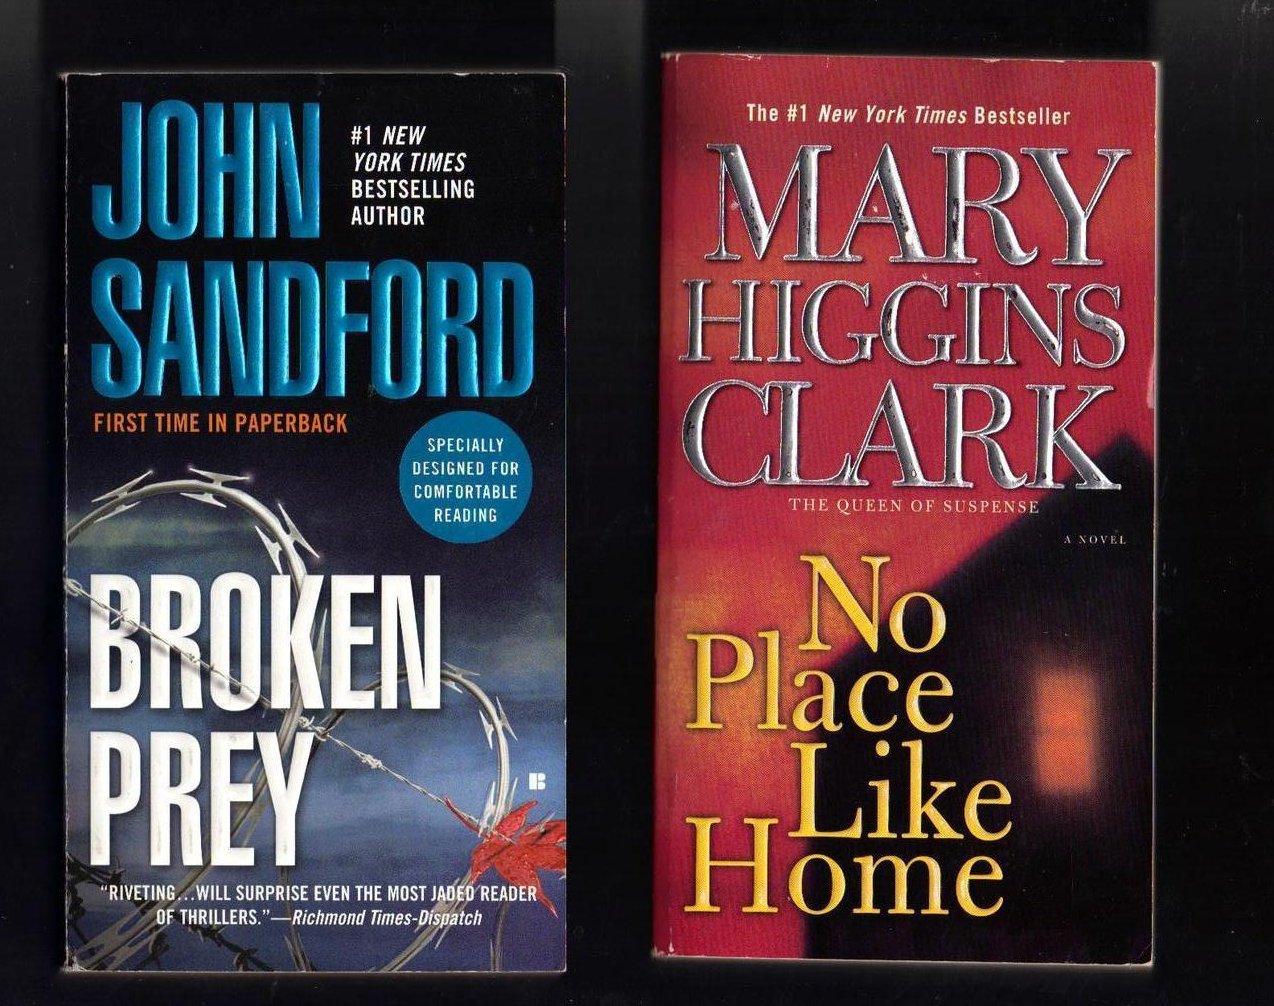 John Sandford and Mary Higgins Clark PB  Lot of 2 Books